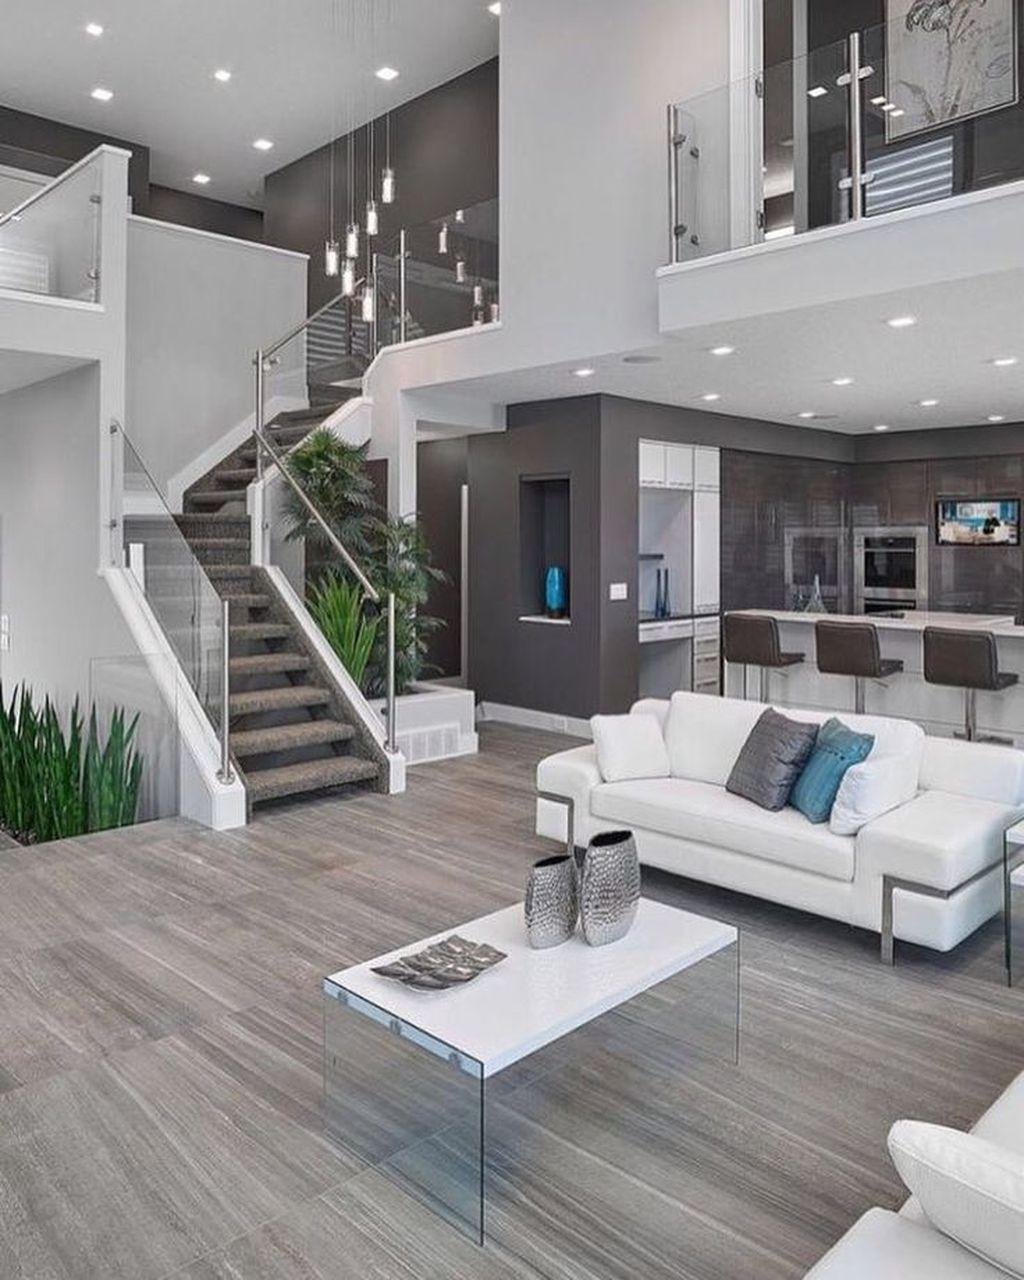 Nice 36 Popular Modern Home Decor Ideas In 2020 Modern House Design Dream Home Design House Interior